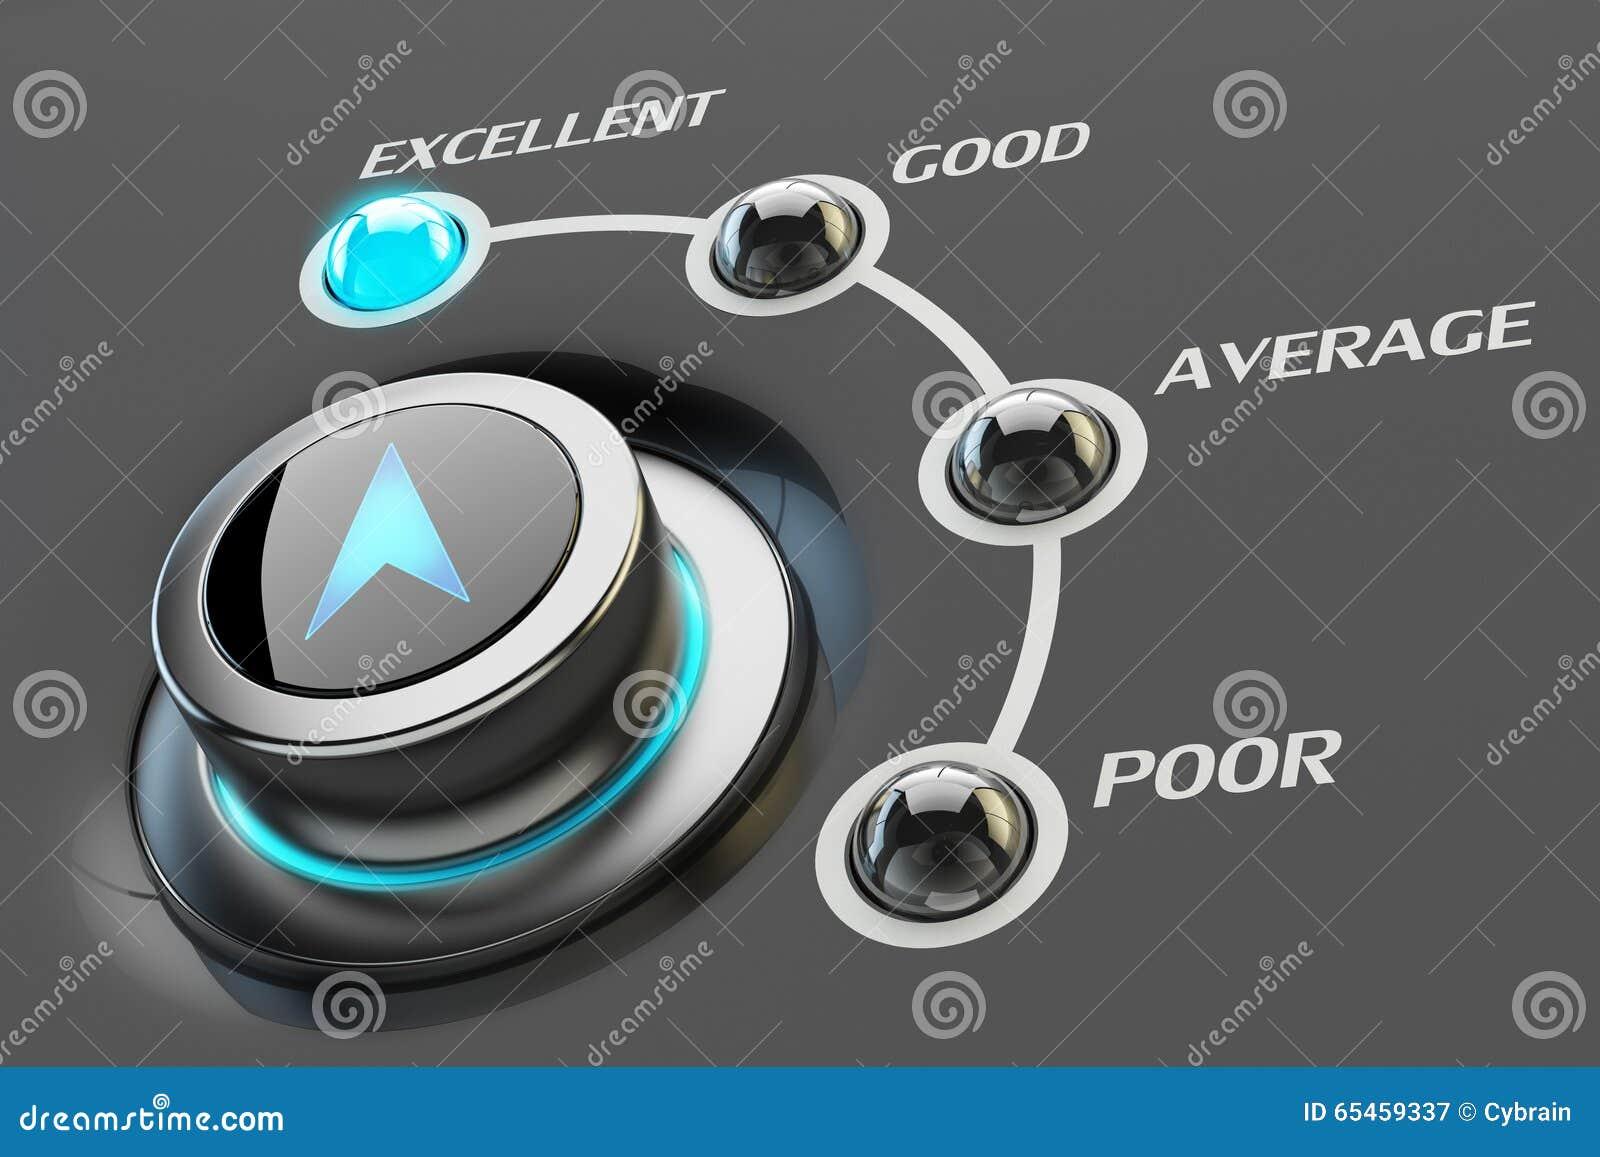 haut niveau de service de qualit u00e9  de comp u00e9tence et de concept d u0026 39 efficacit u00e9 illustration stock